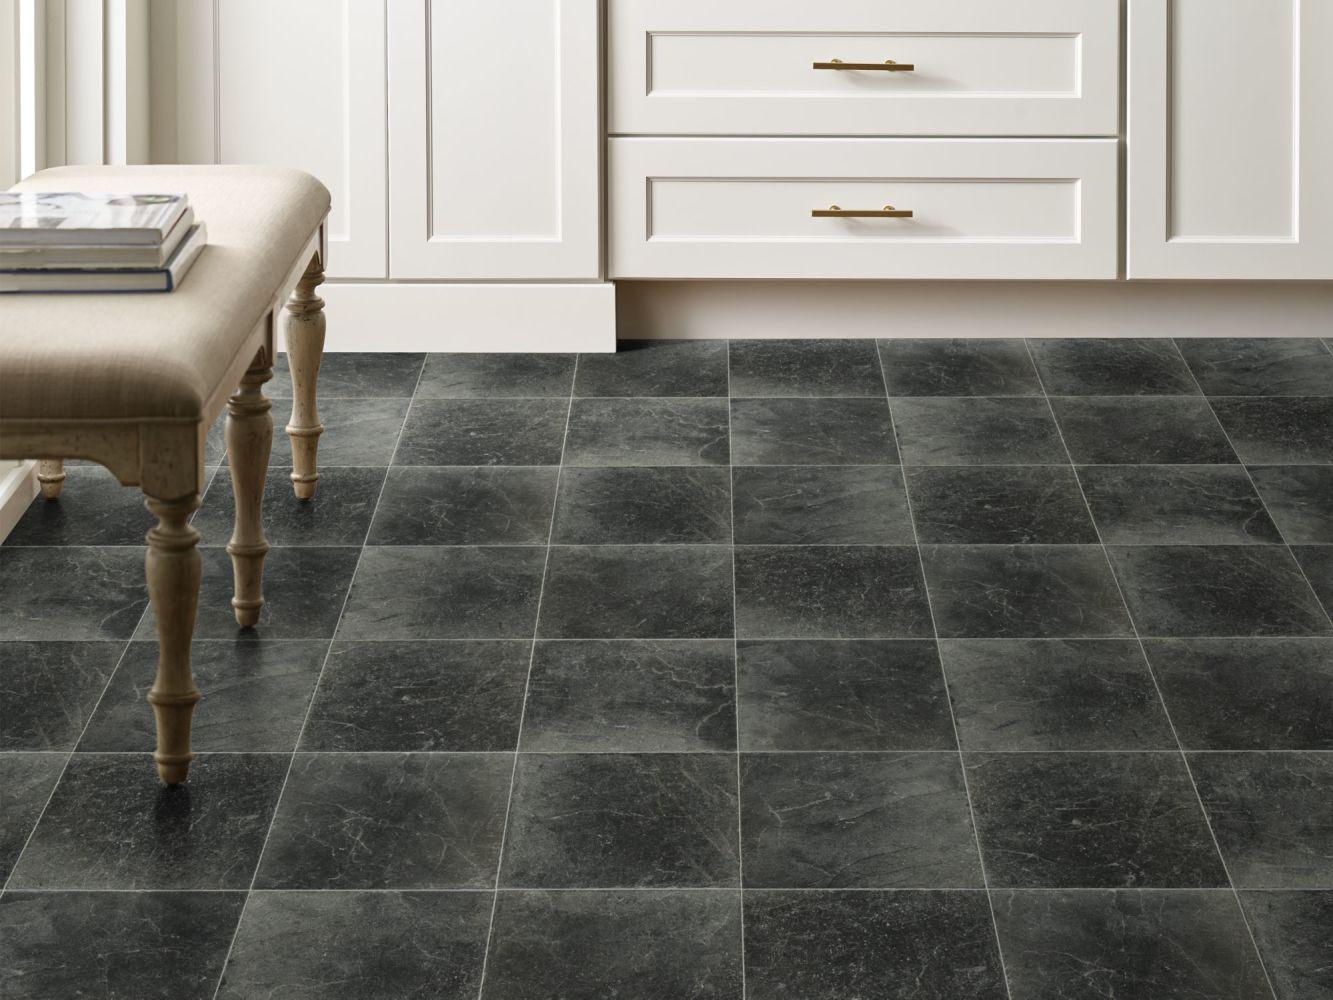 Shaw Floors Resilient Residential Cottage Chic Pepper 00405_1048V